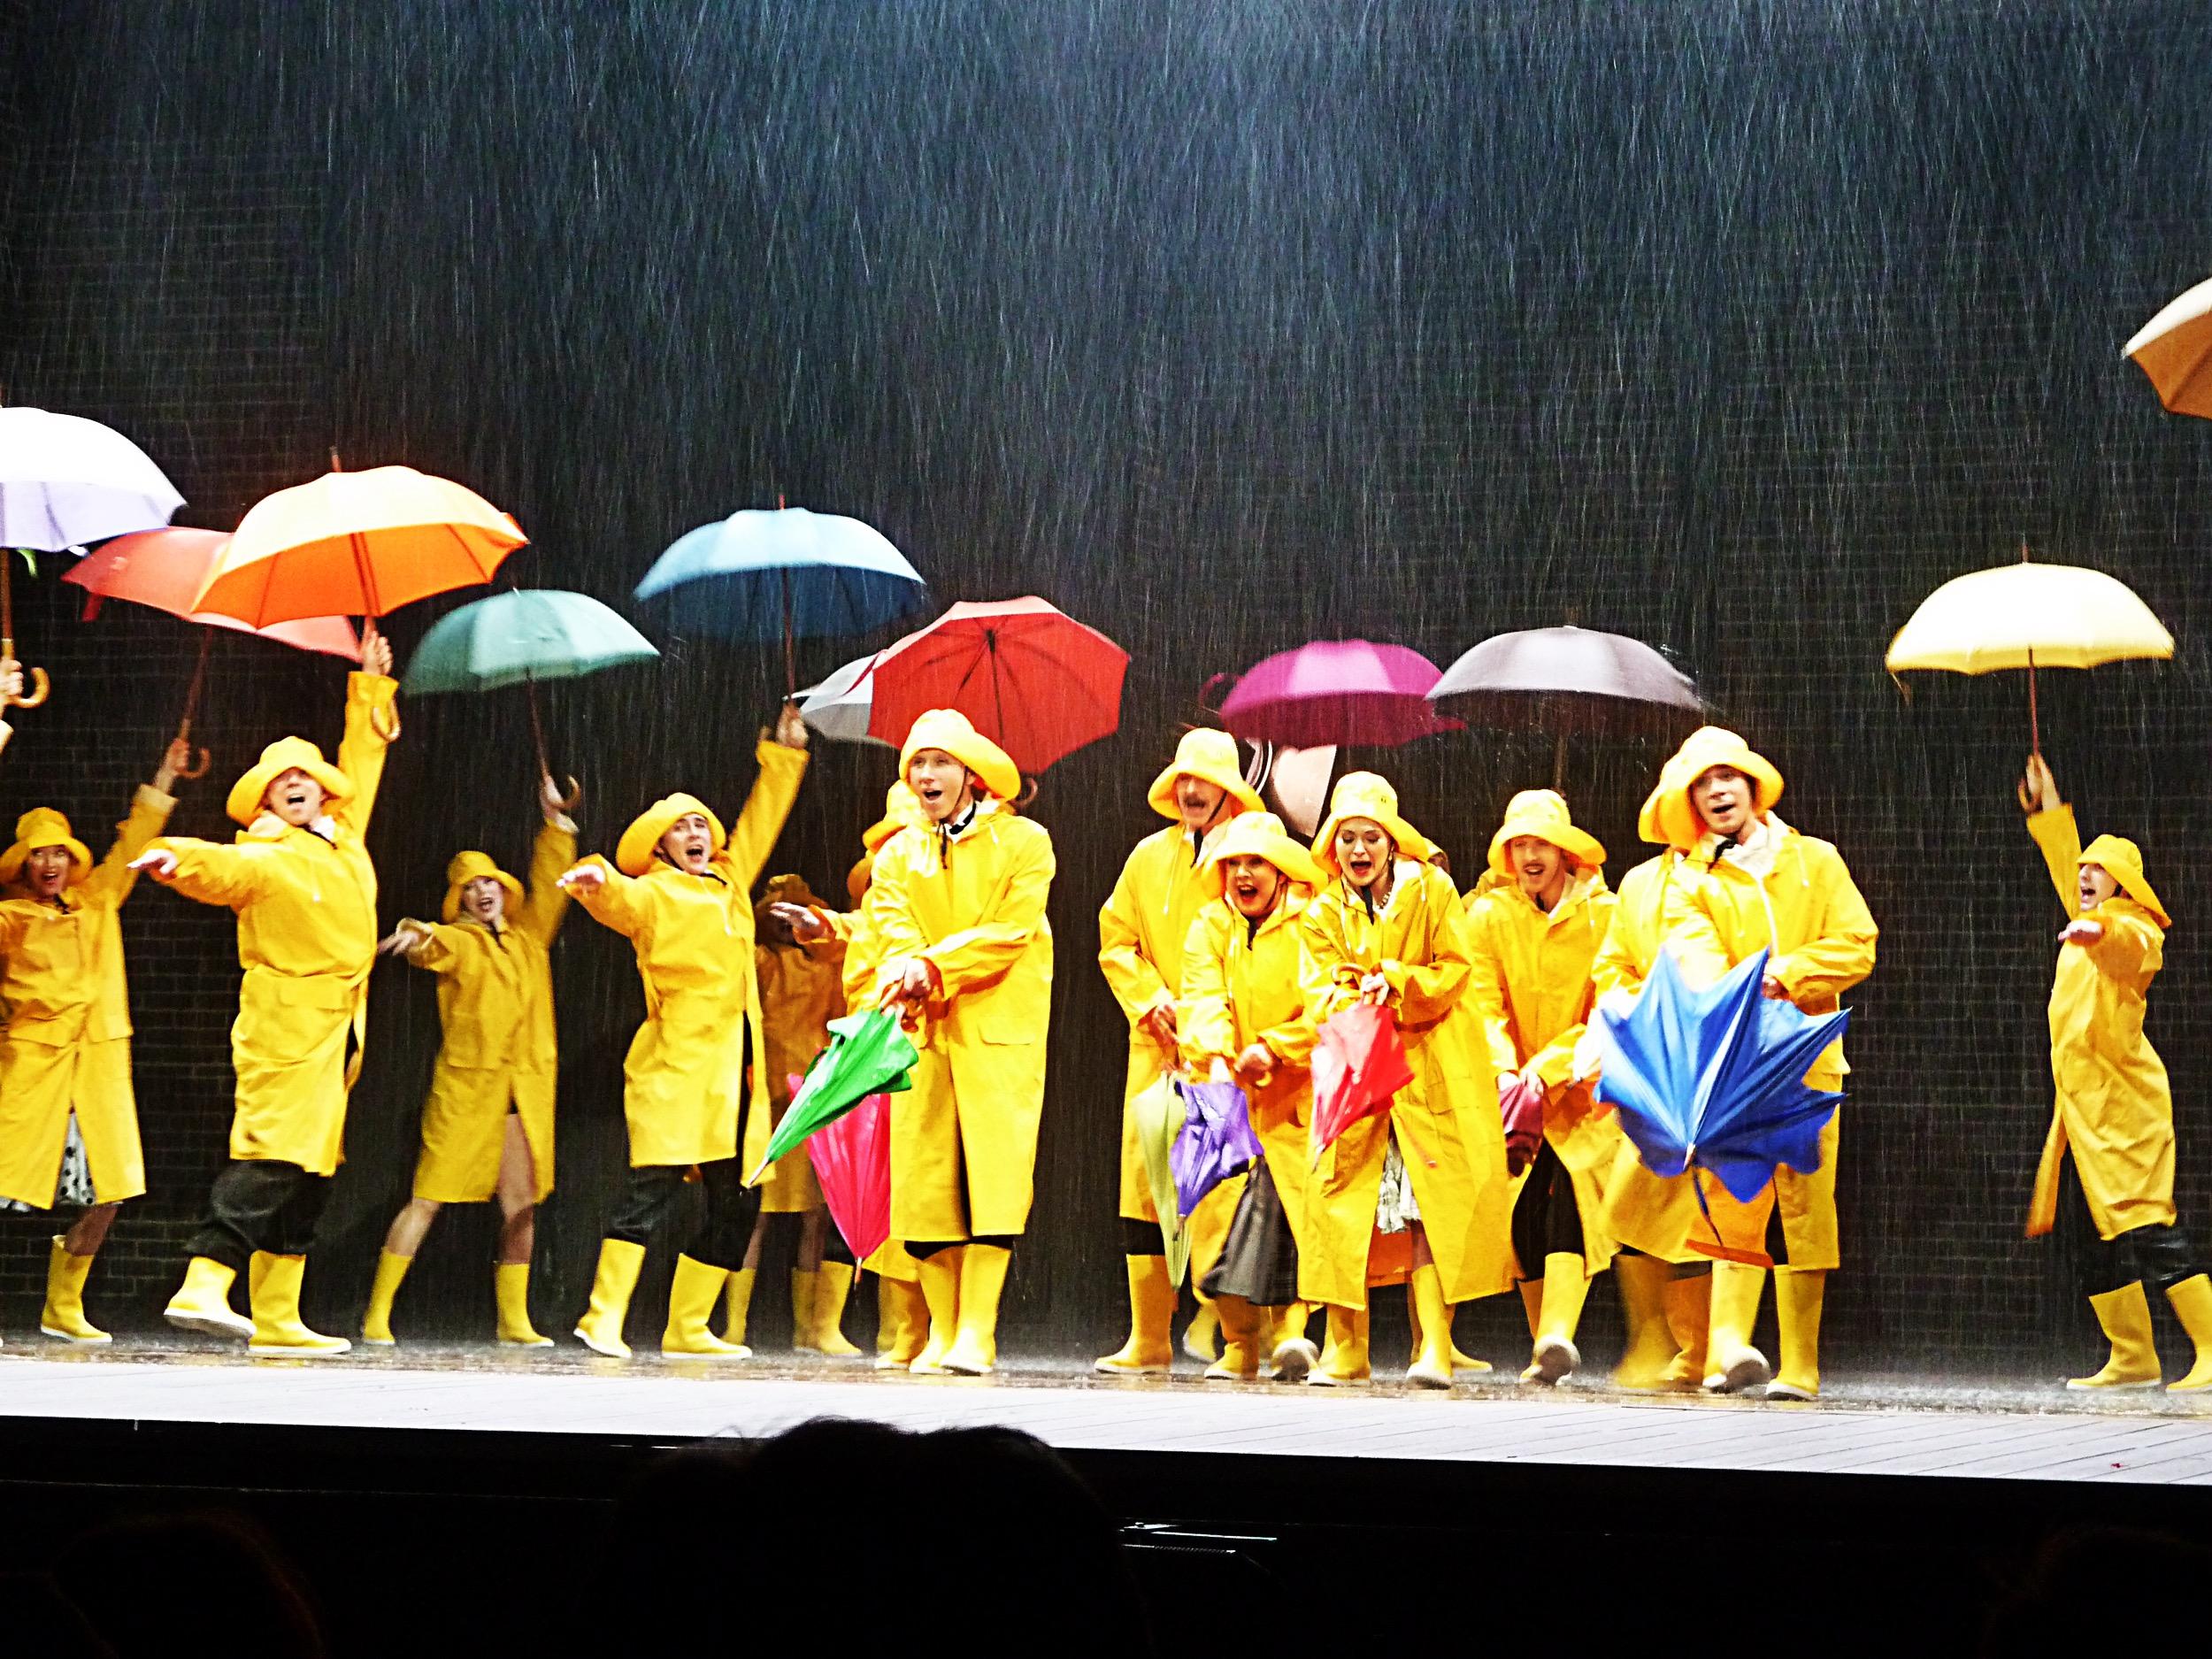 Grand Foyer Theatre Du Chatelet : Singin in the rain au grand palais �tourdissant